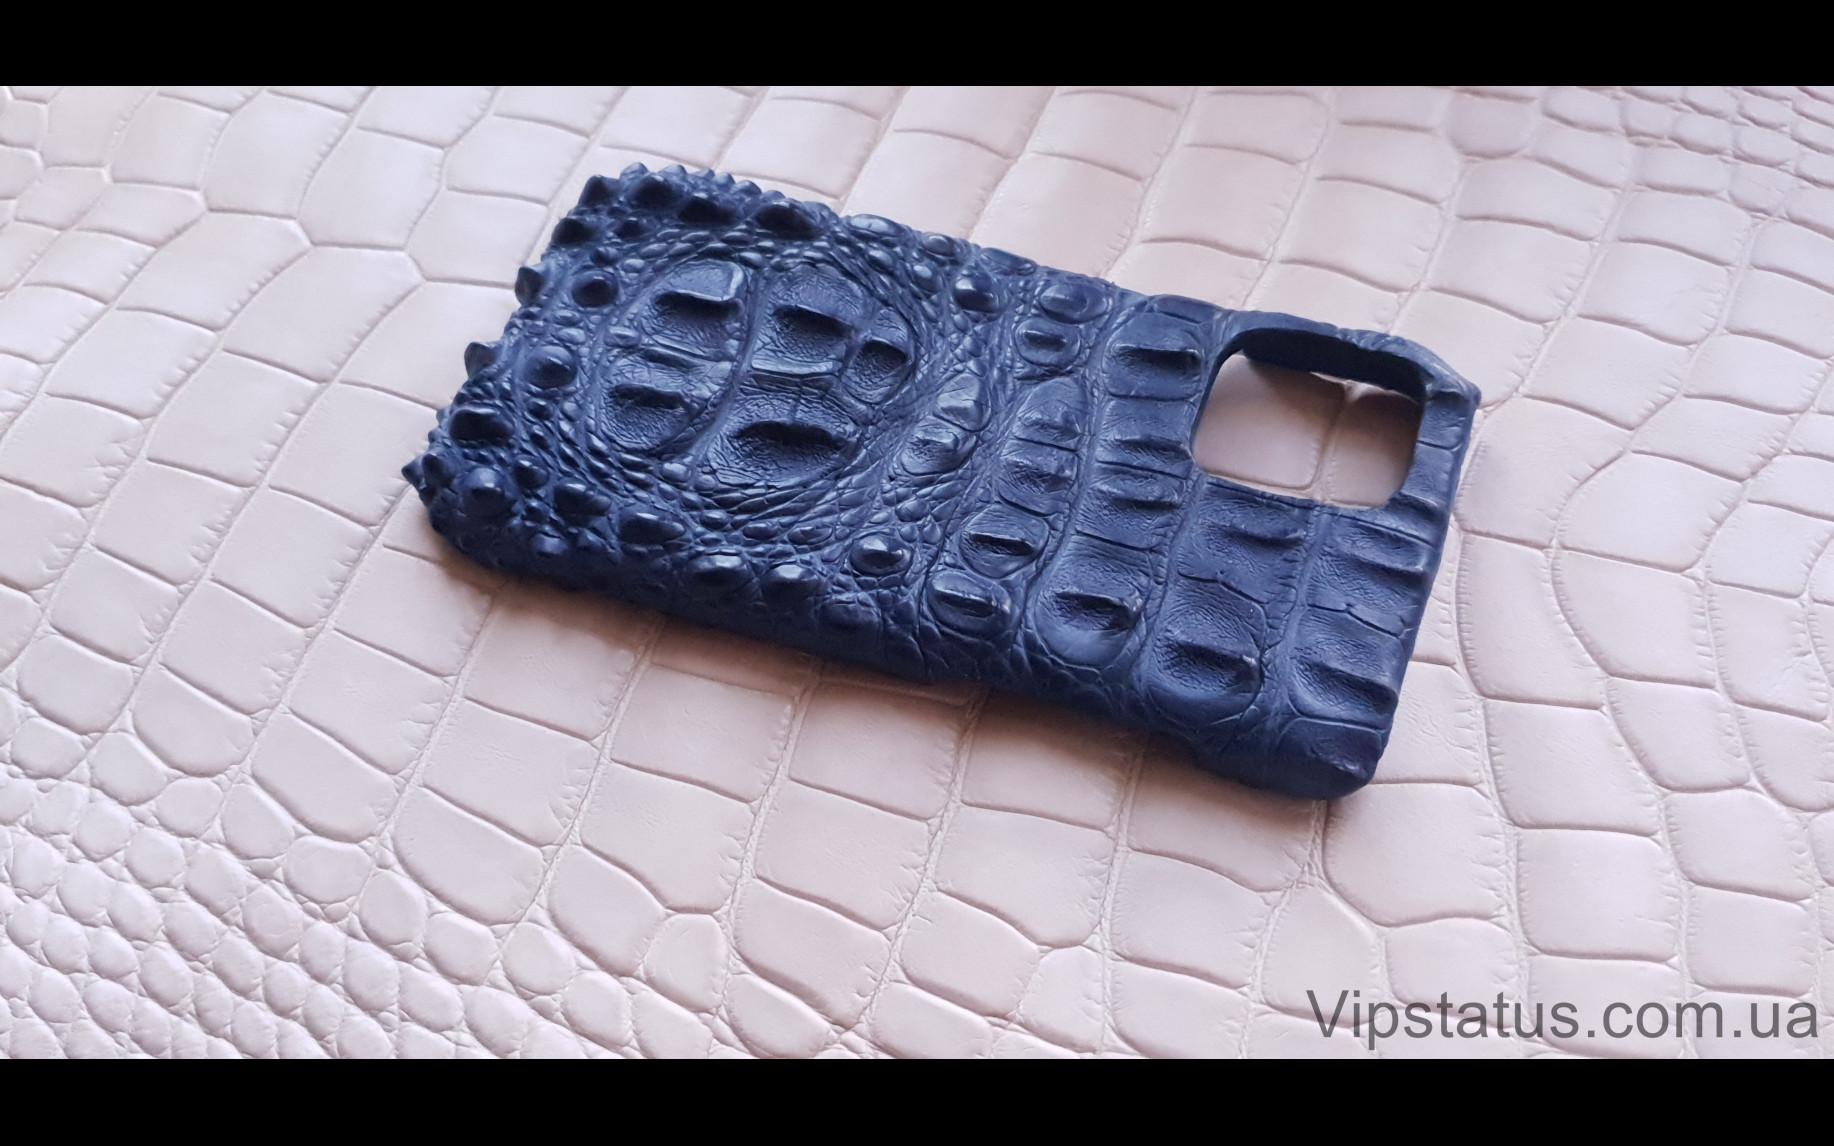 Elite Blue King Премиум чехол IPhone 11 12 Pro Max кожа крокодила Blue King Premium case IPhone 11 12 Pro Max Crocodile leather image 2